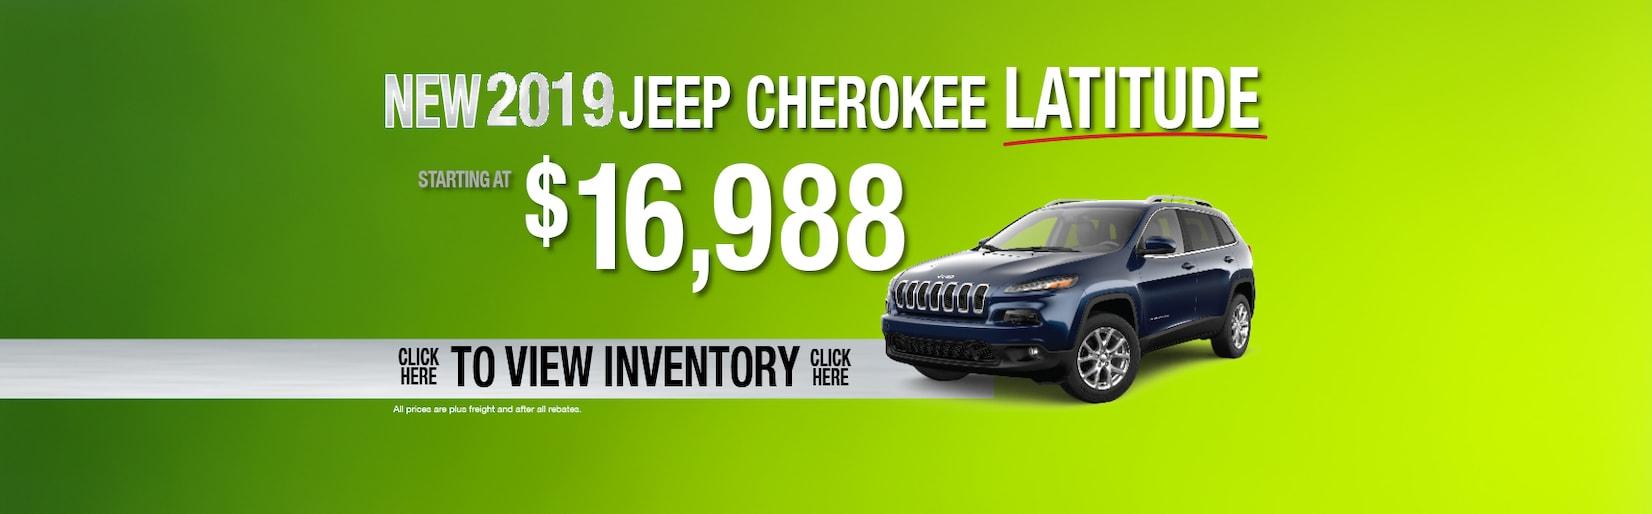 Landmark South DCJR | Dodge Chrysler Jeep Ram Dealership - Belton, MO